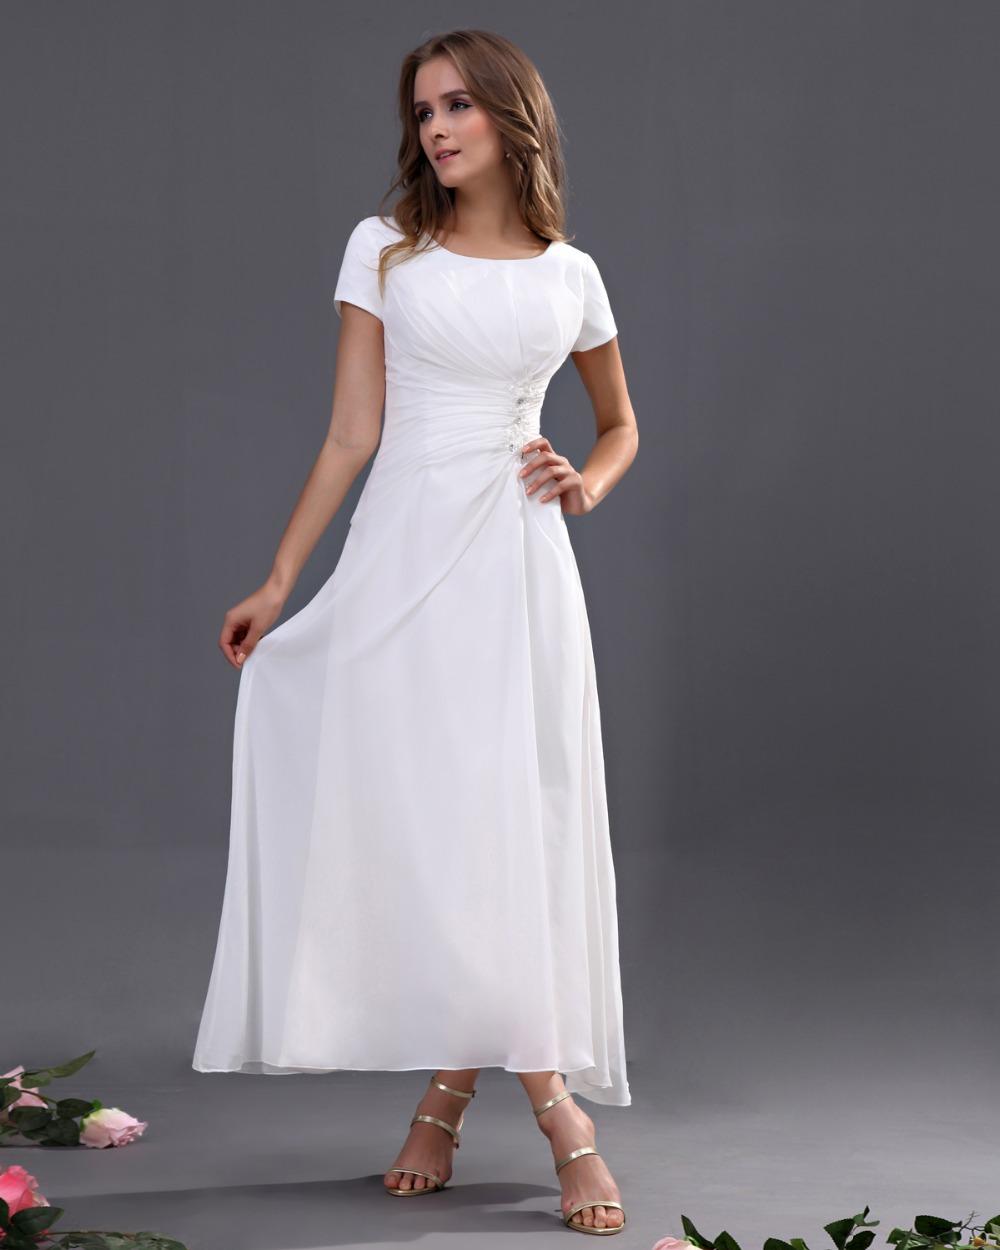 Dresses For Sale Cheap